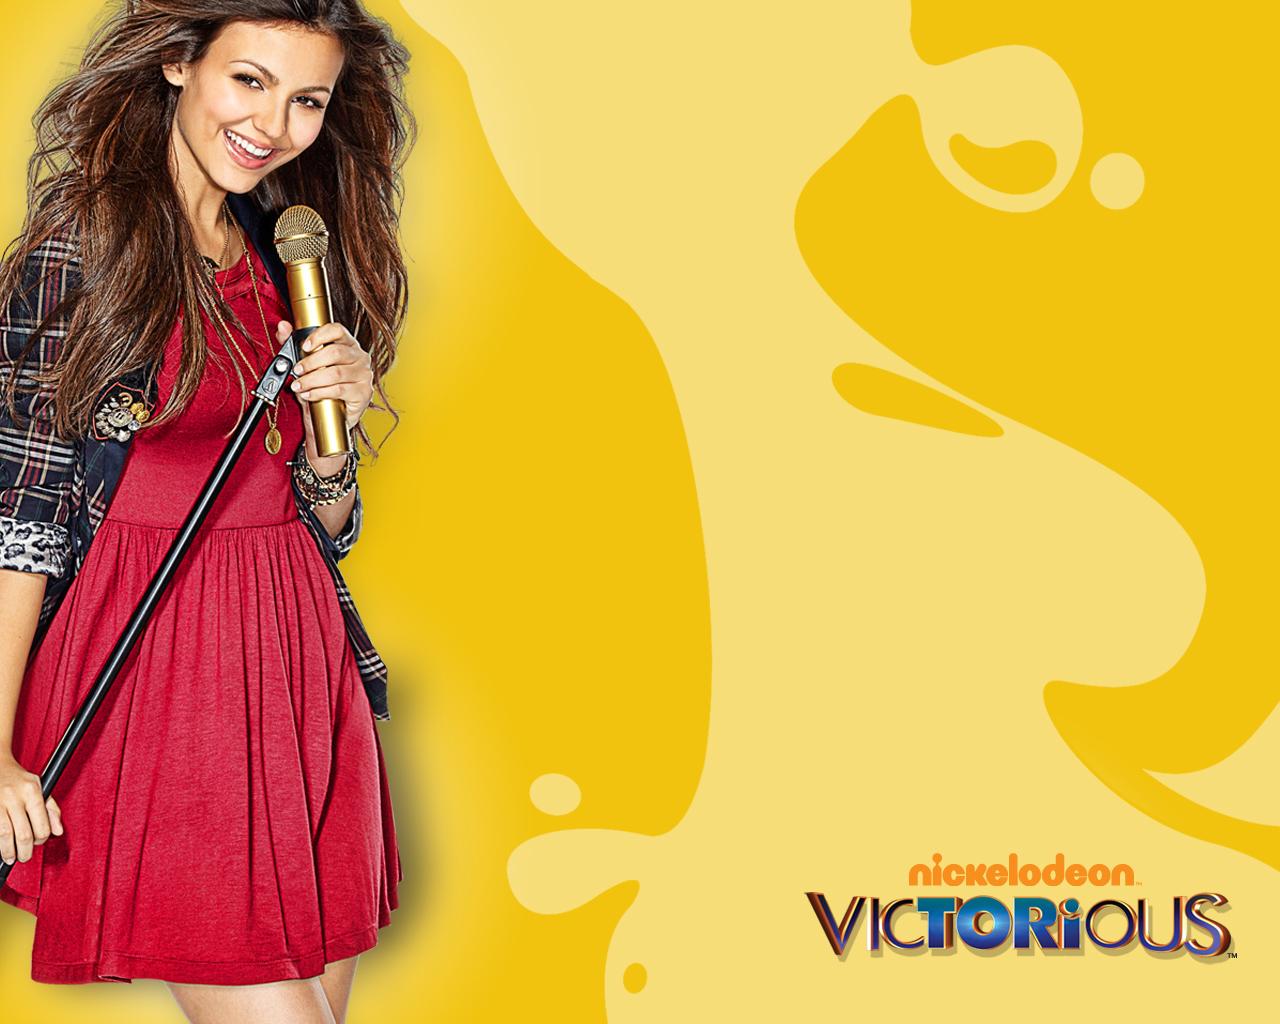 http://3.bp.blogspot.com/_mmekflzYRy0/TPqKVfV5ZUI/AAAAAAAAAJ4/SweGk4Qm69A/s1600/victorious_wallpaper5_1280.jpg